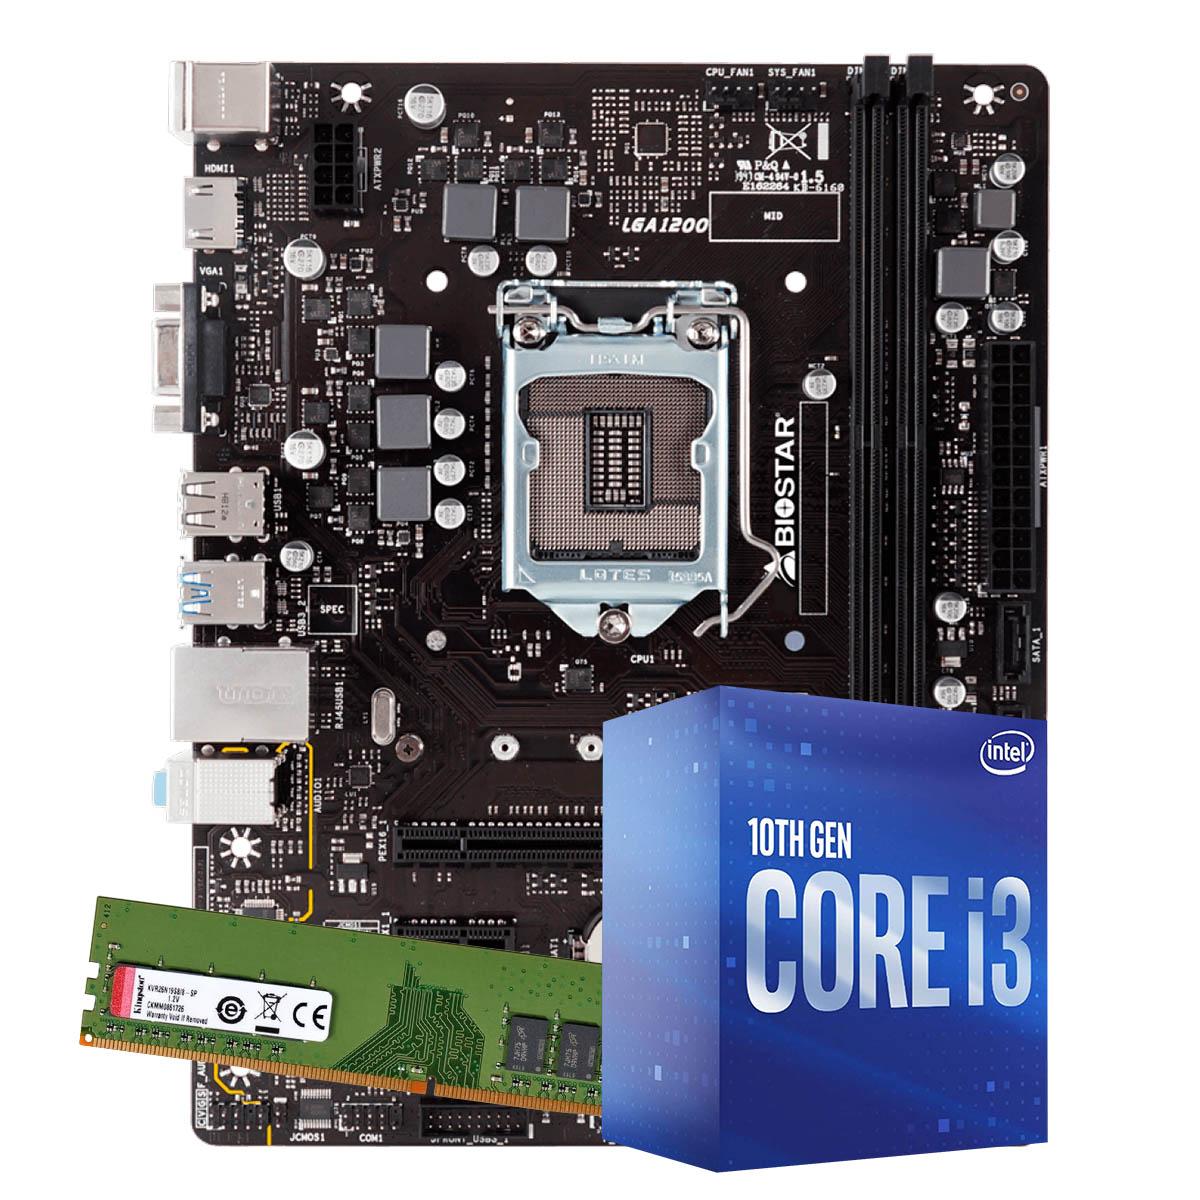 Kit Upgrade intel 10º geração core i3-10100 3.6ghz ,Placa Mãe Biostar H410MH LGA 1200, Memória Kingston DDR4 8GB